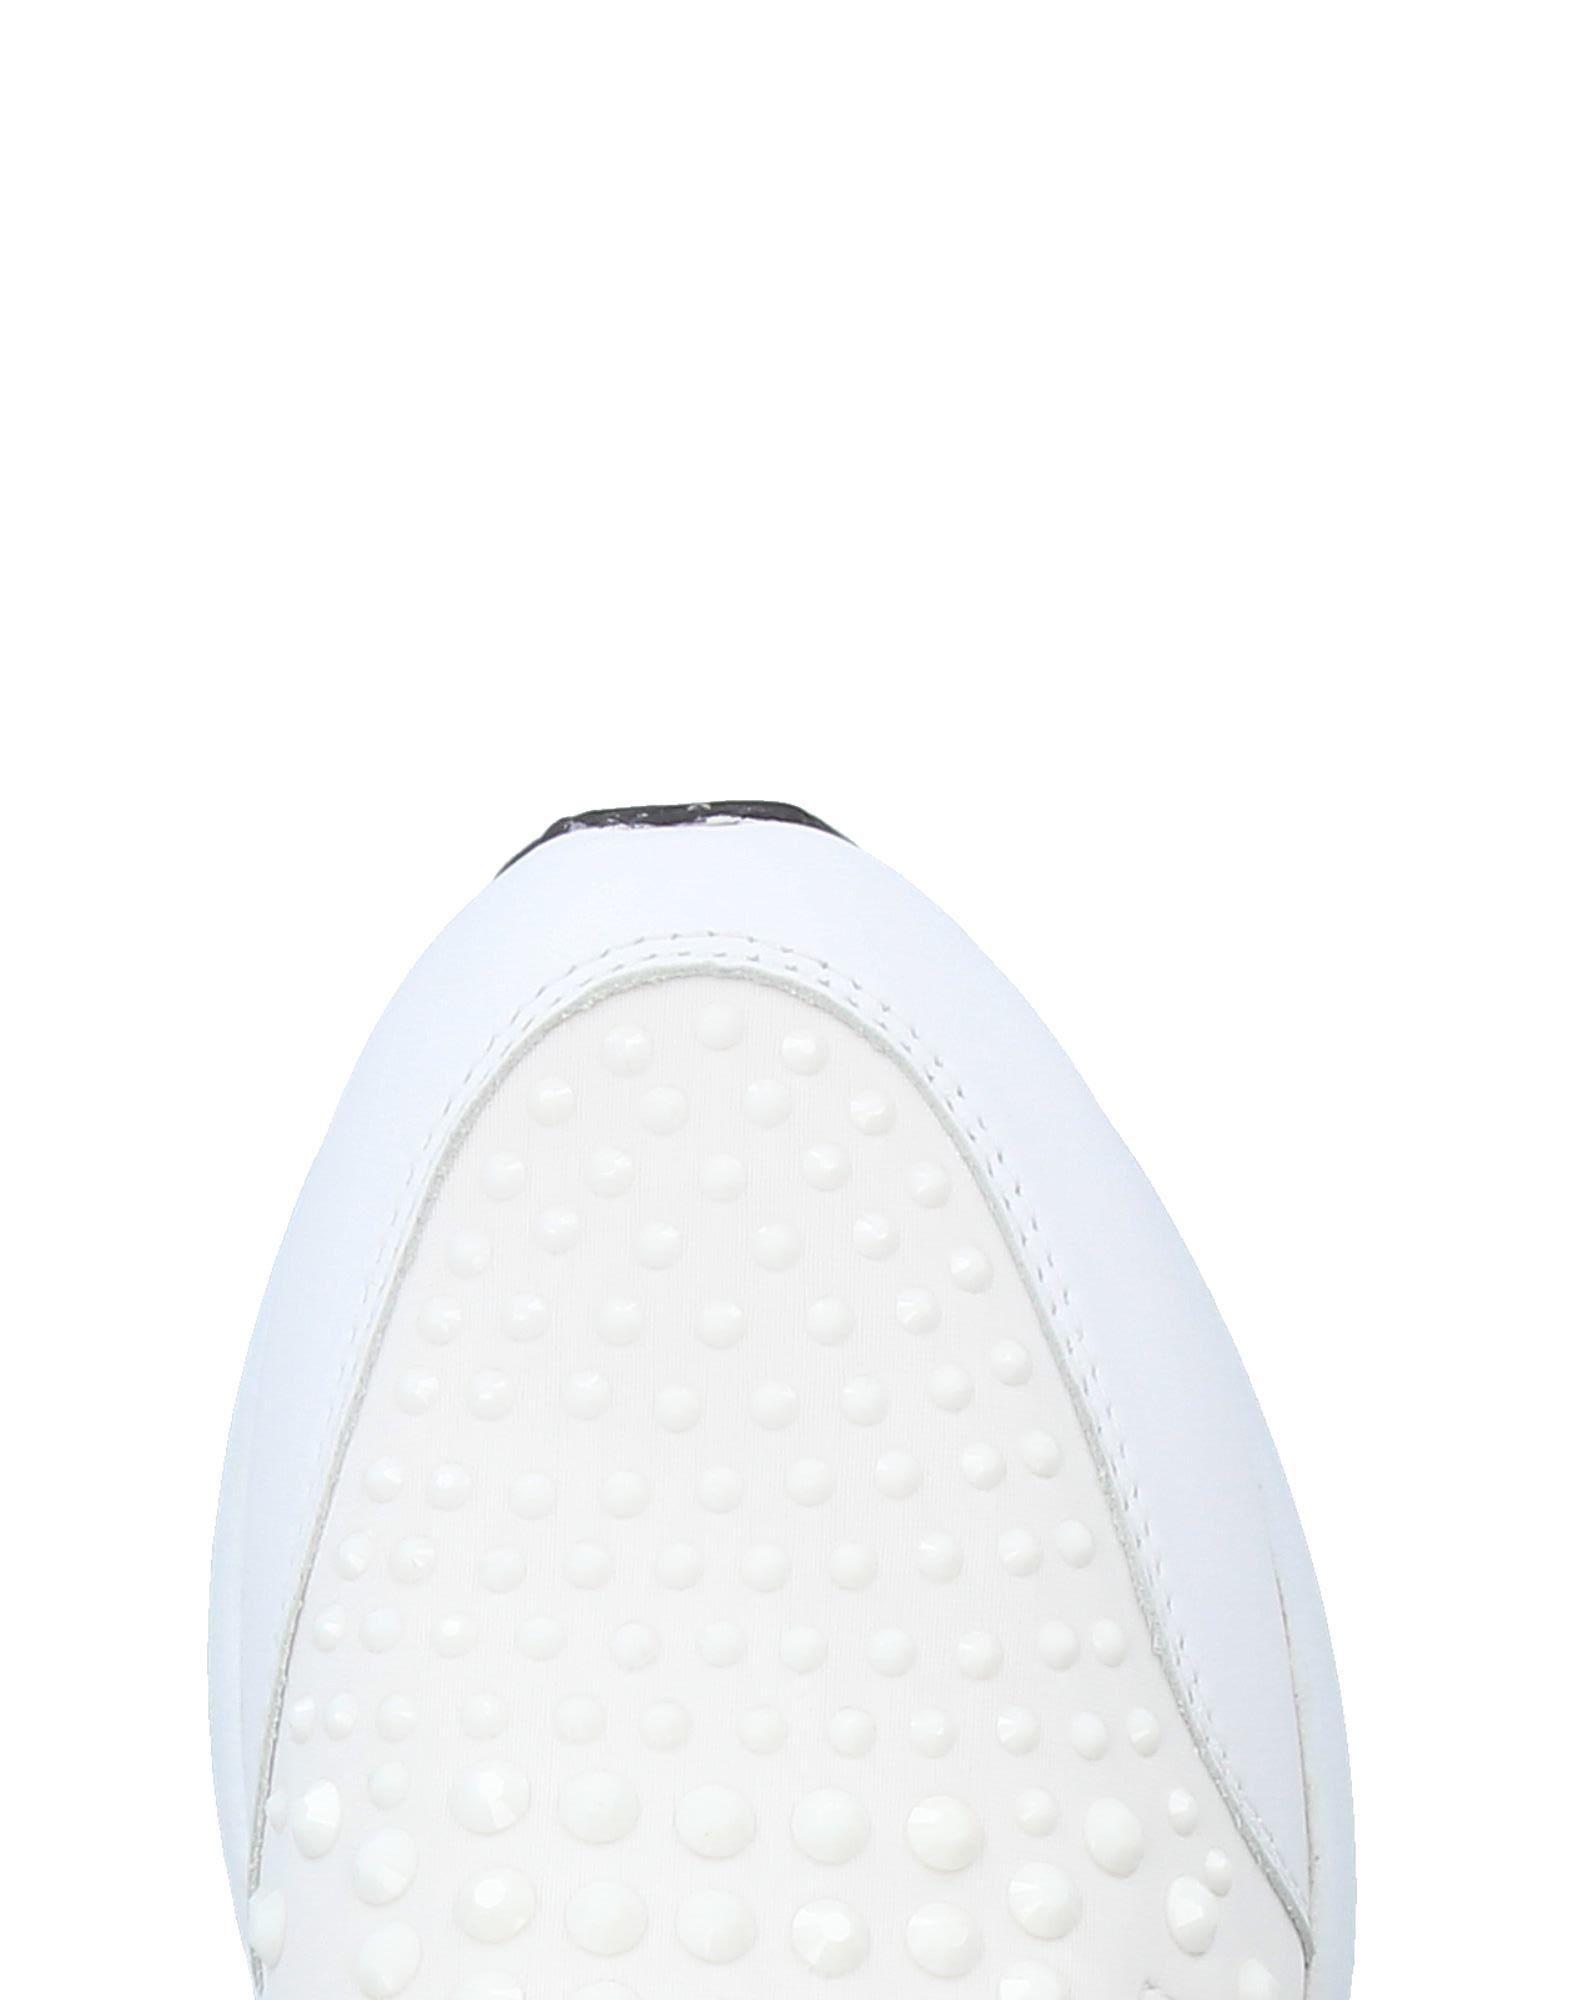 Geox Sneakers Damen  11192066DV Gute Qualität beliebte Schuhe